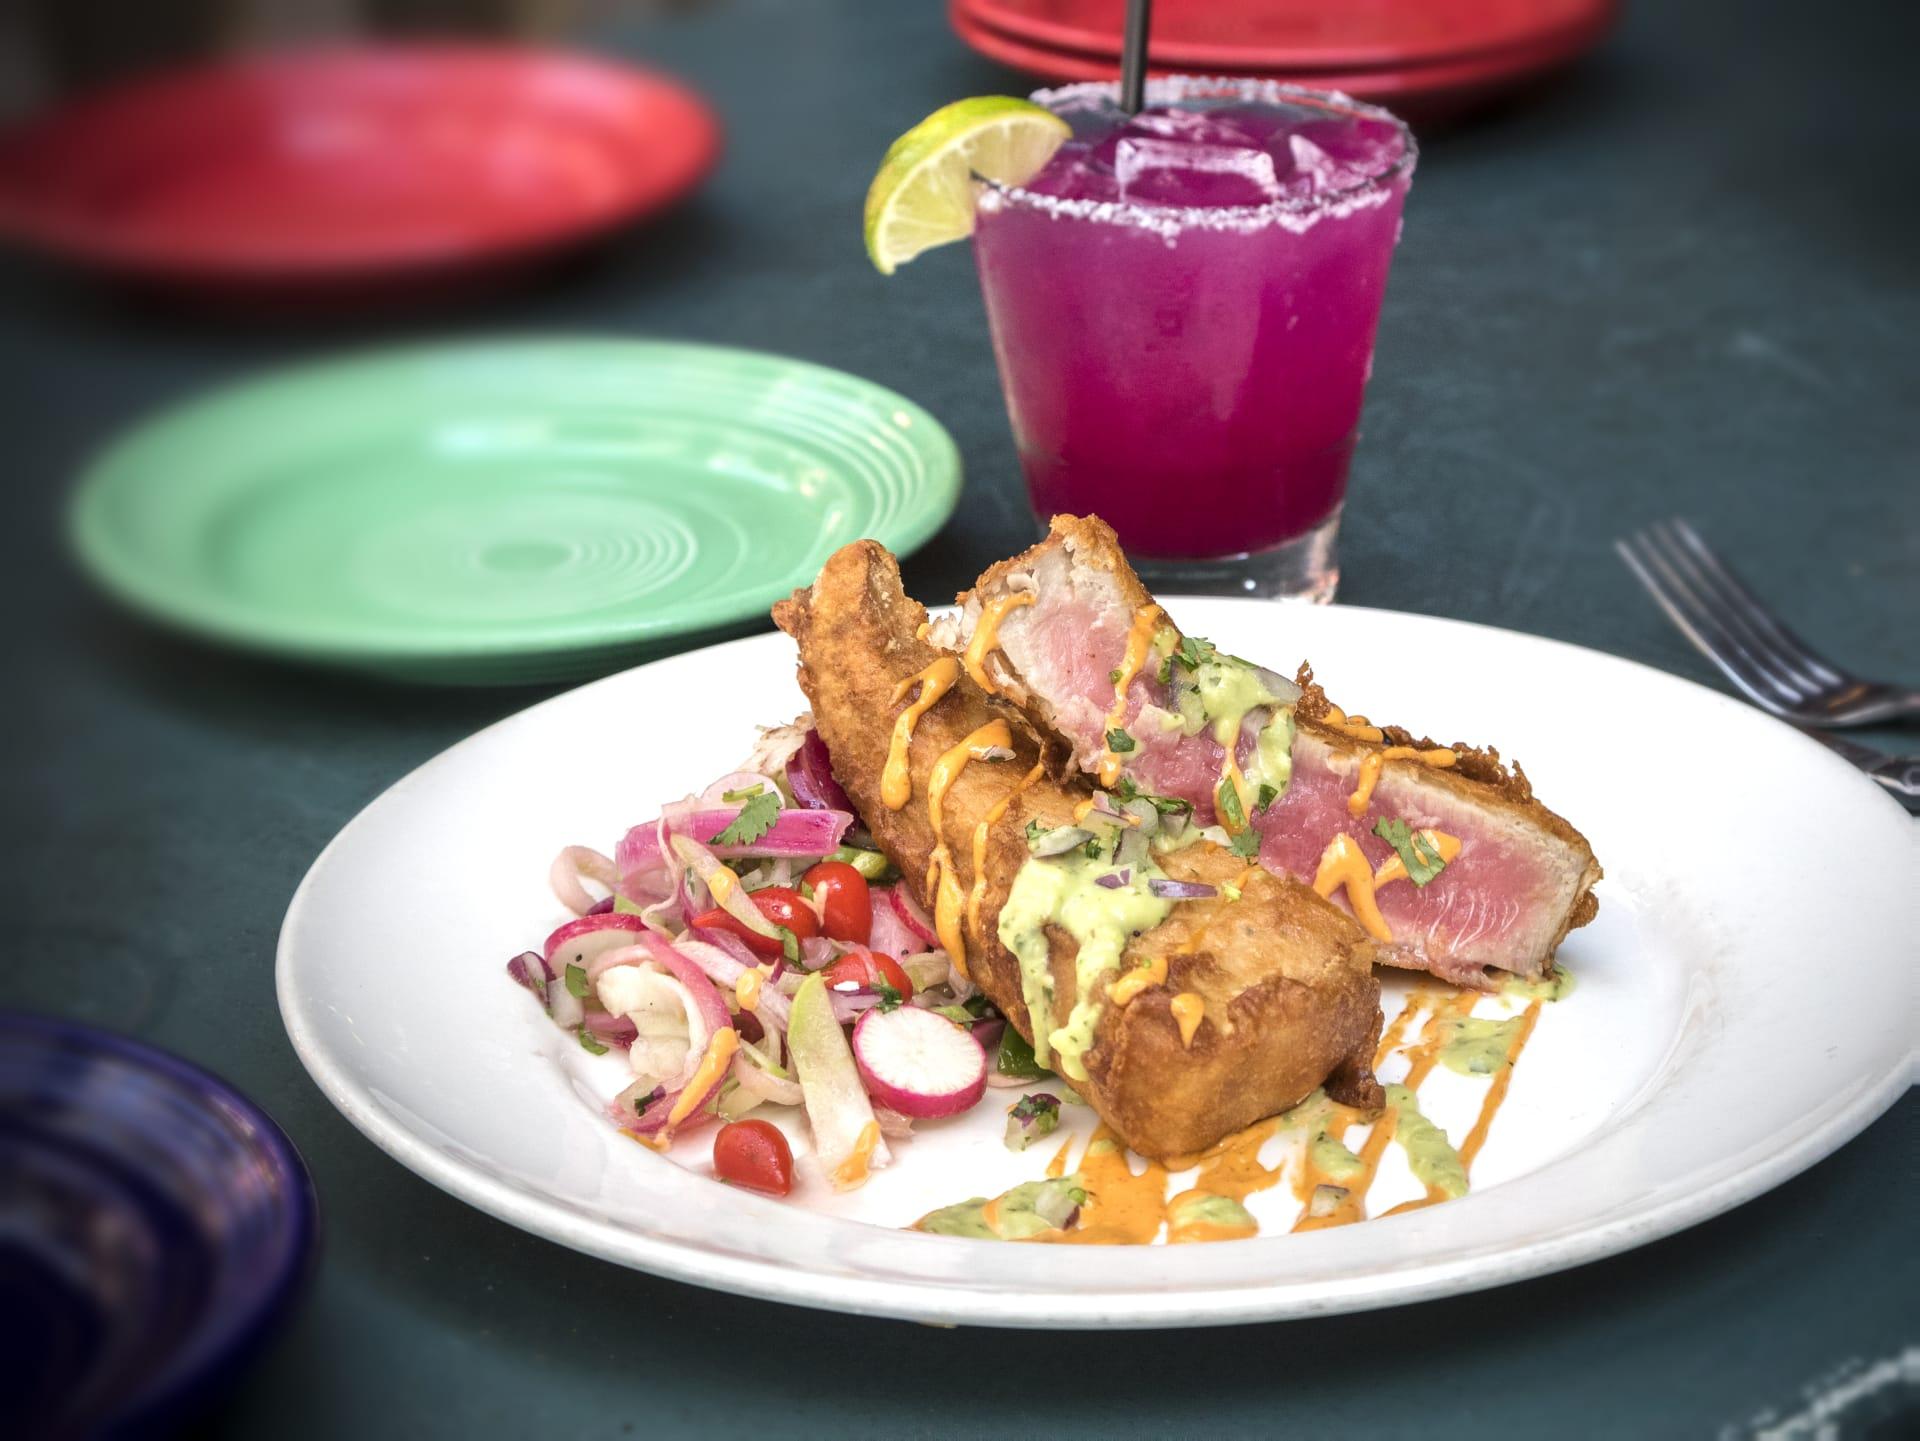 Chef Jose Villalva's Ahi Tuna Frita